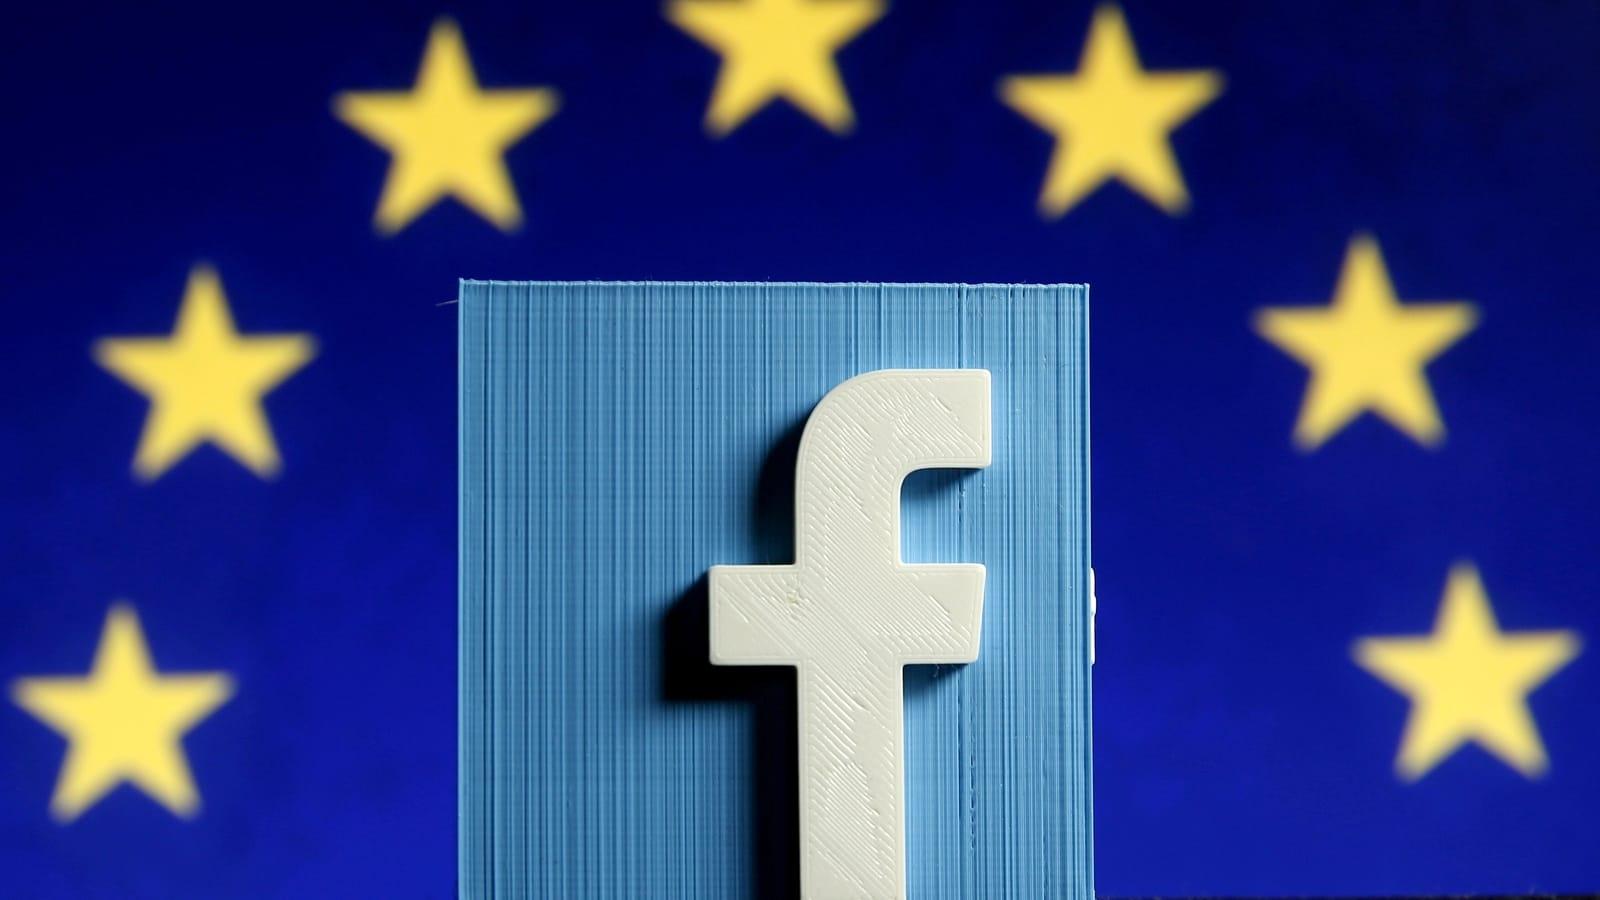 New EU guidelines target Facebook, Google over monetising fake news